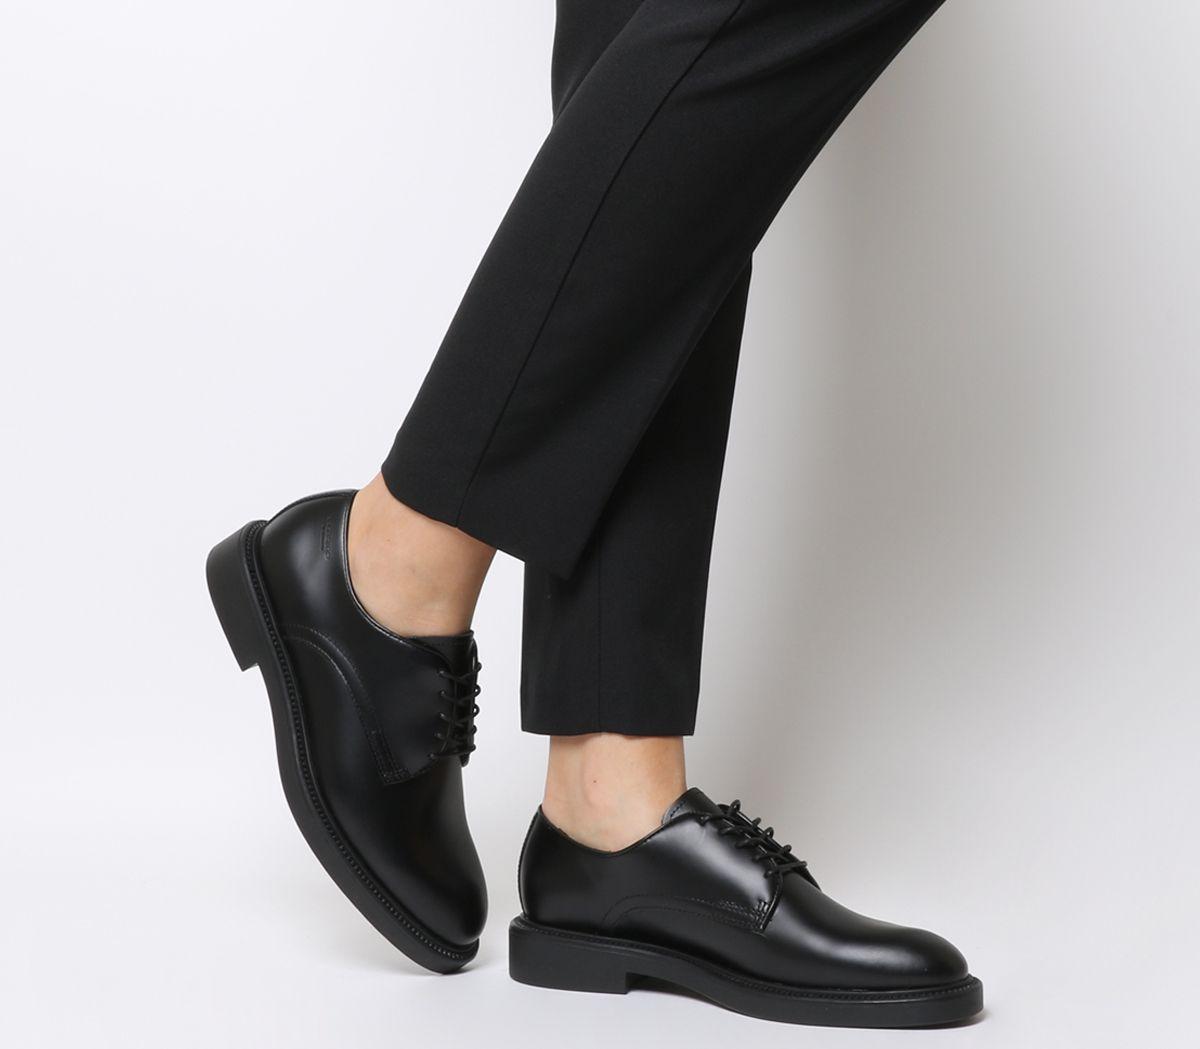 4294d9e5958bd4 Vagabond Alex W Flats Black Leather - Flats